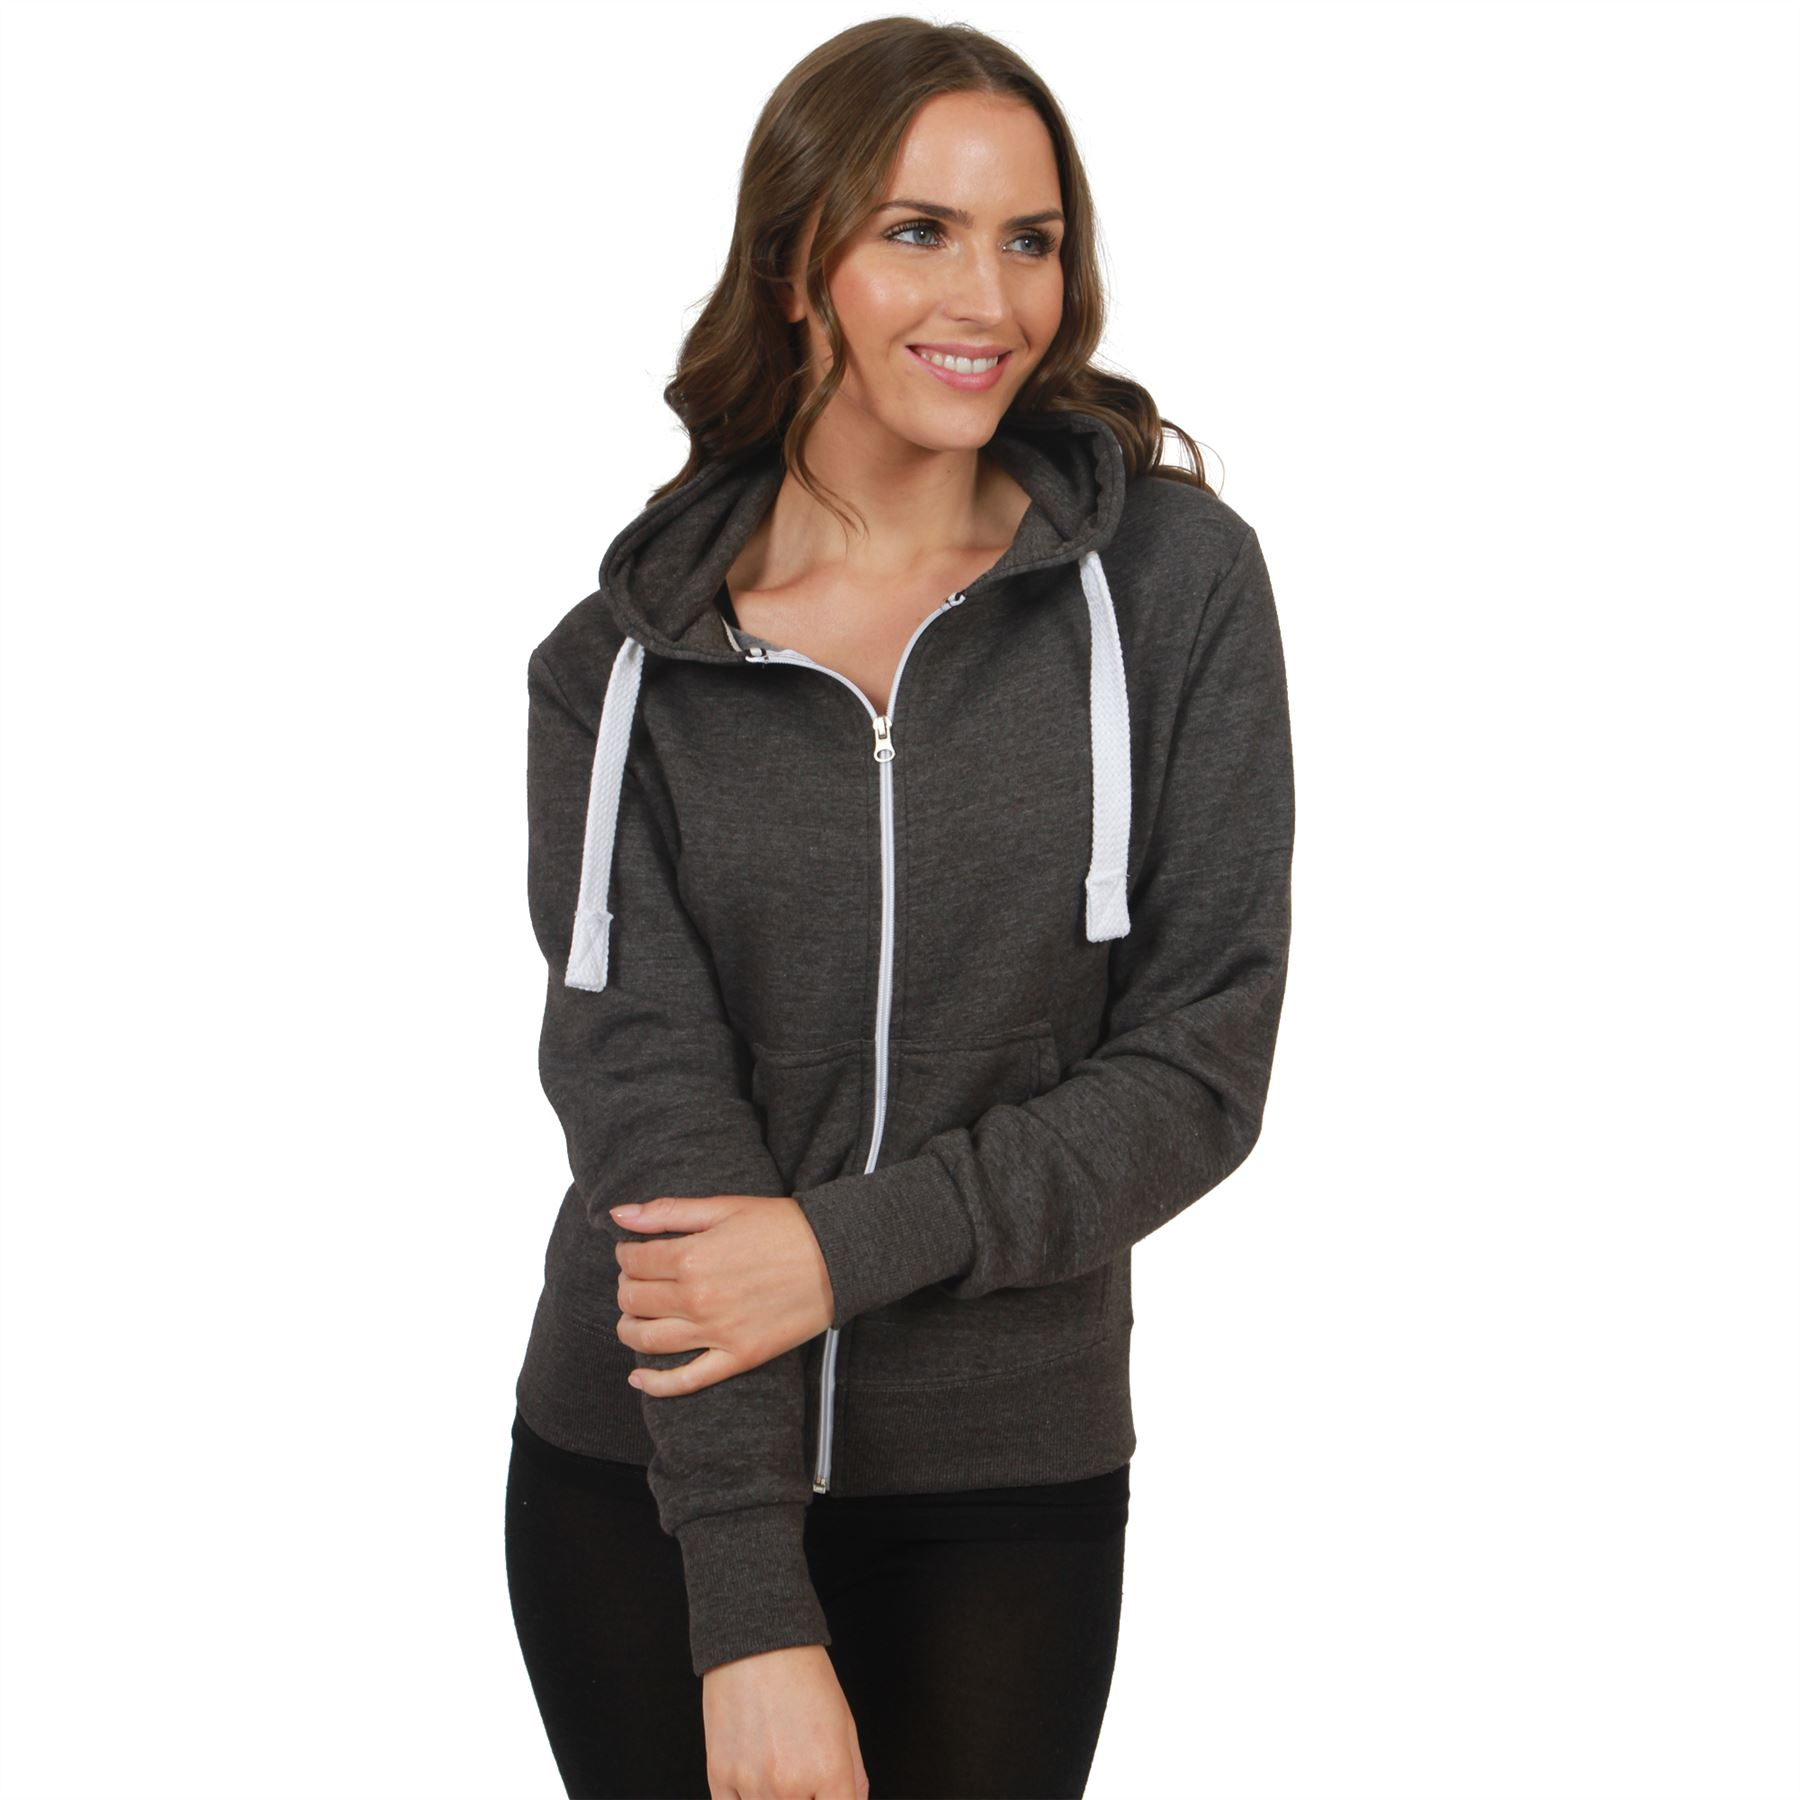 Womens zippered hoodies